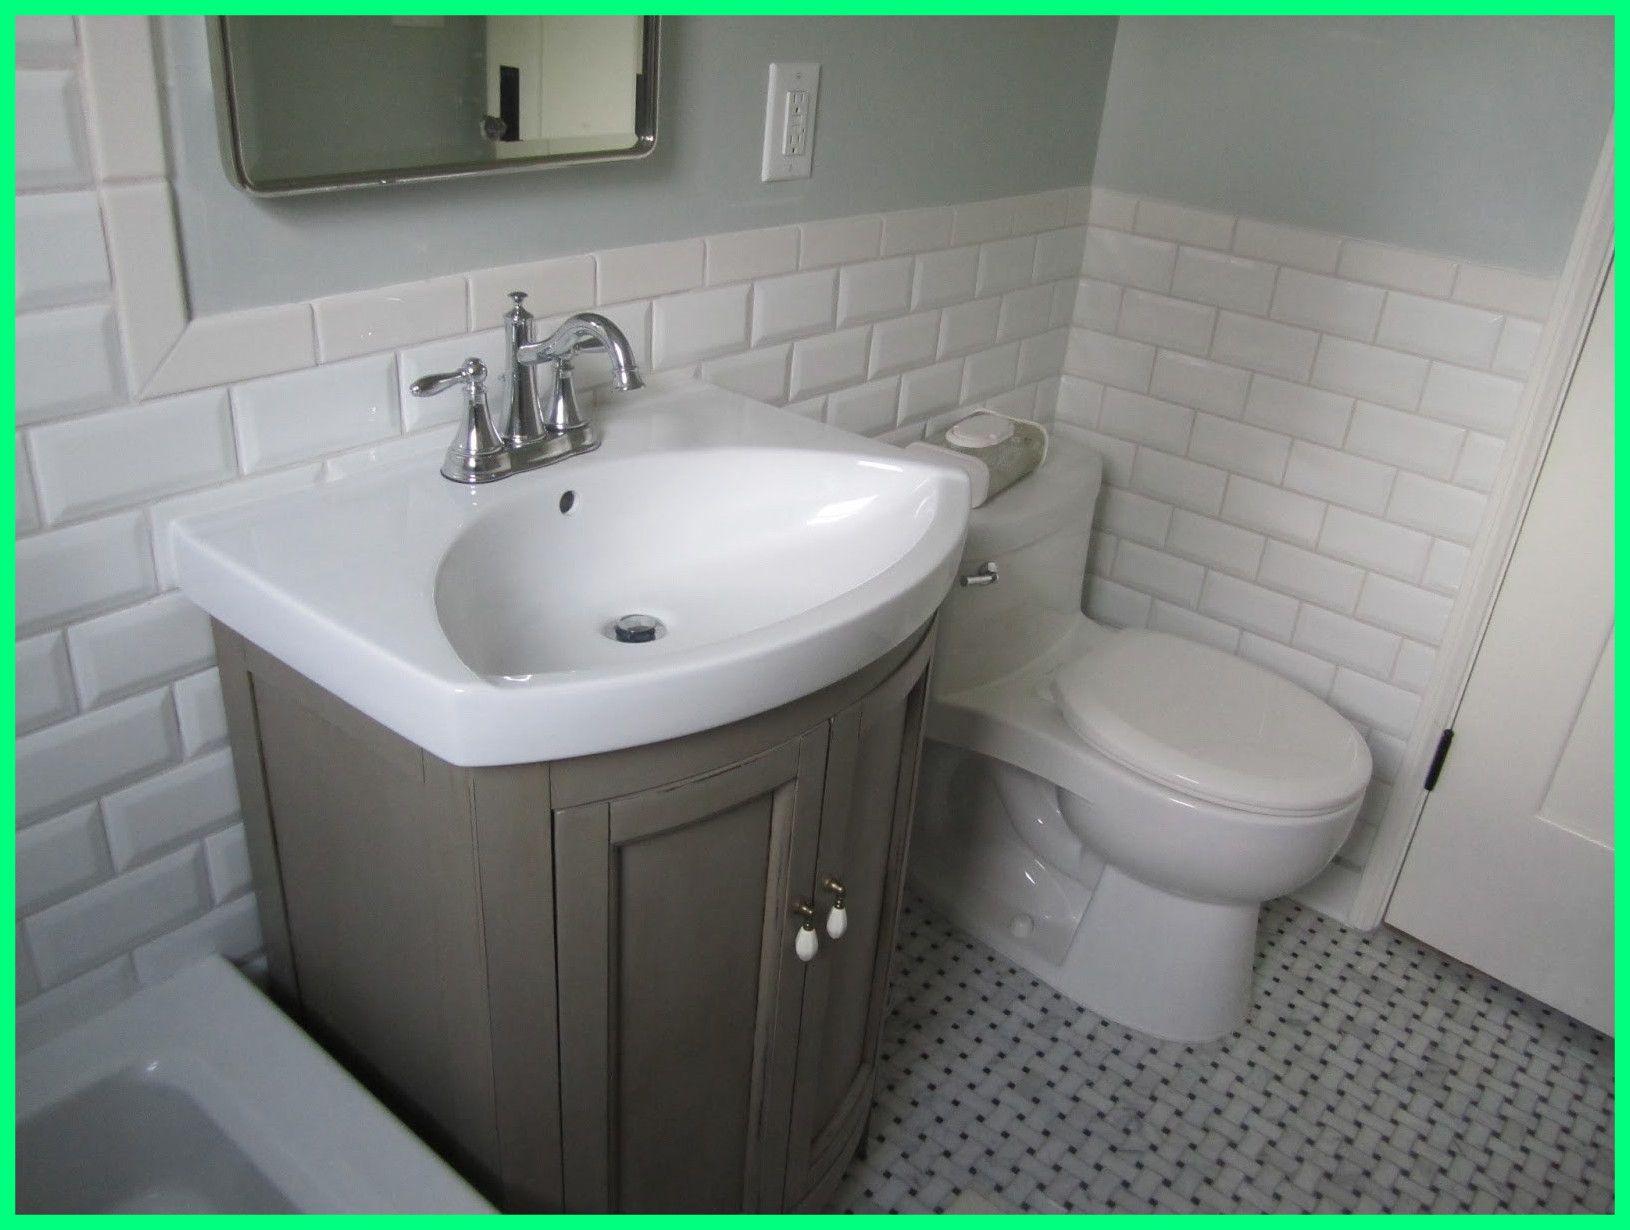 Snazzy Bathroom Ideas  June, 2018